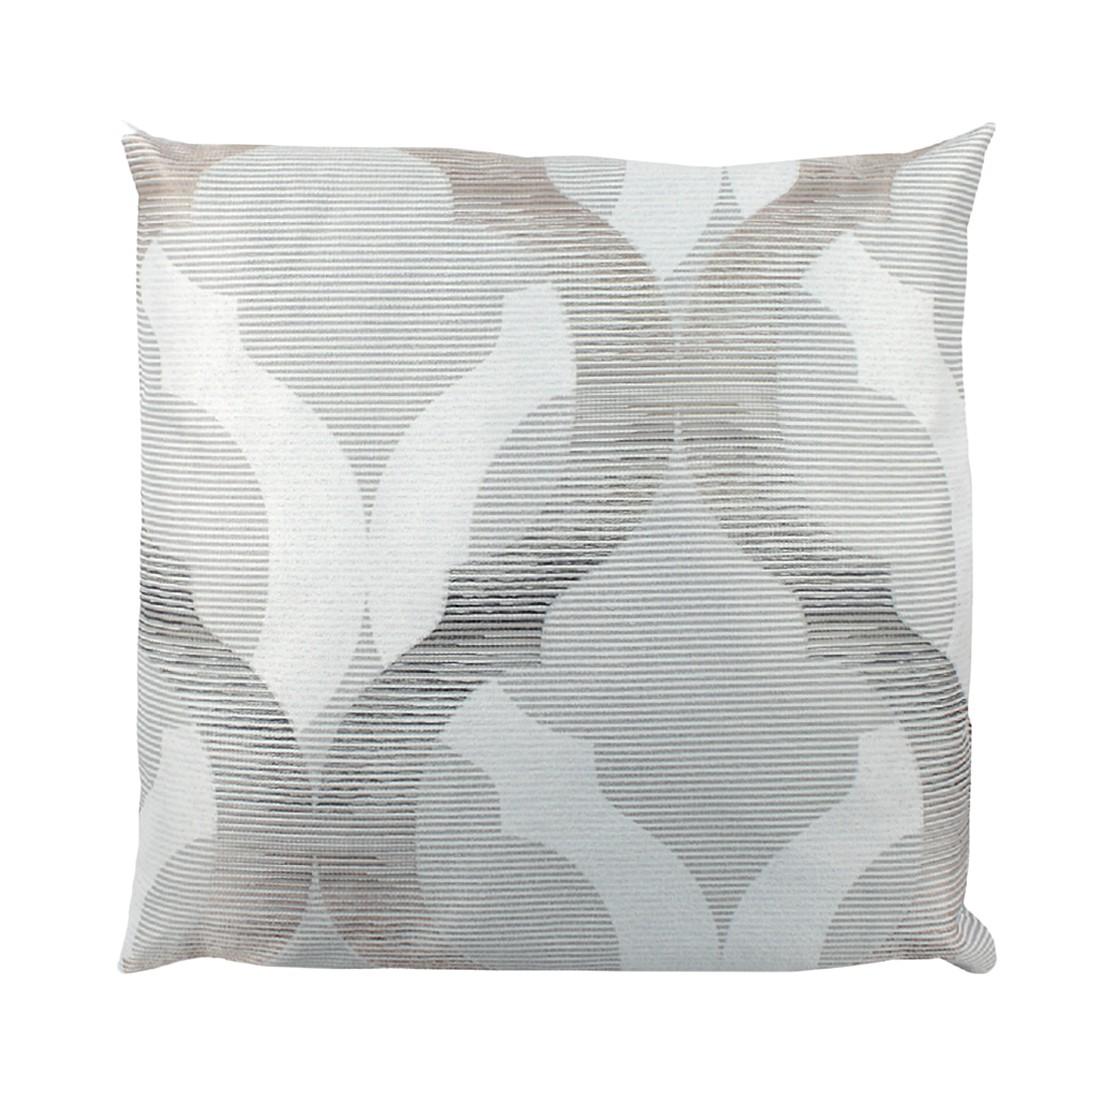 Kissenhülle Herna – Beige – 50 x 50 cm, Home Wohnideen online bestellen